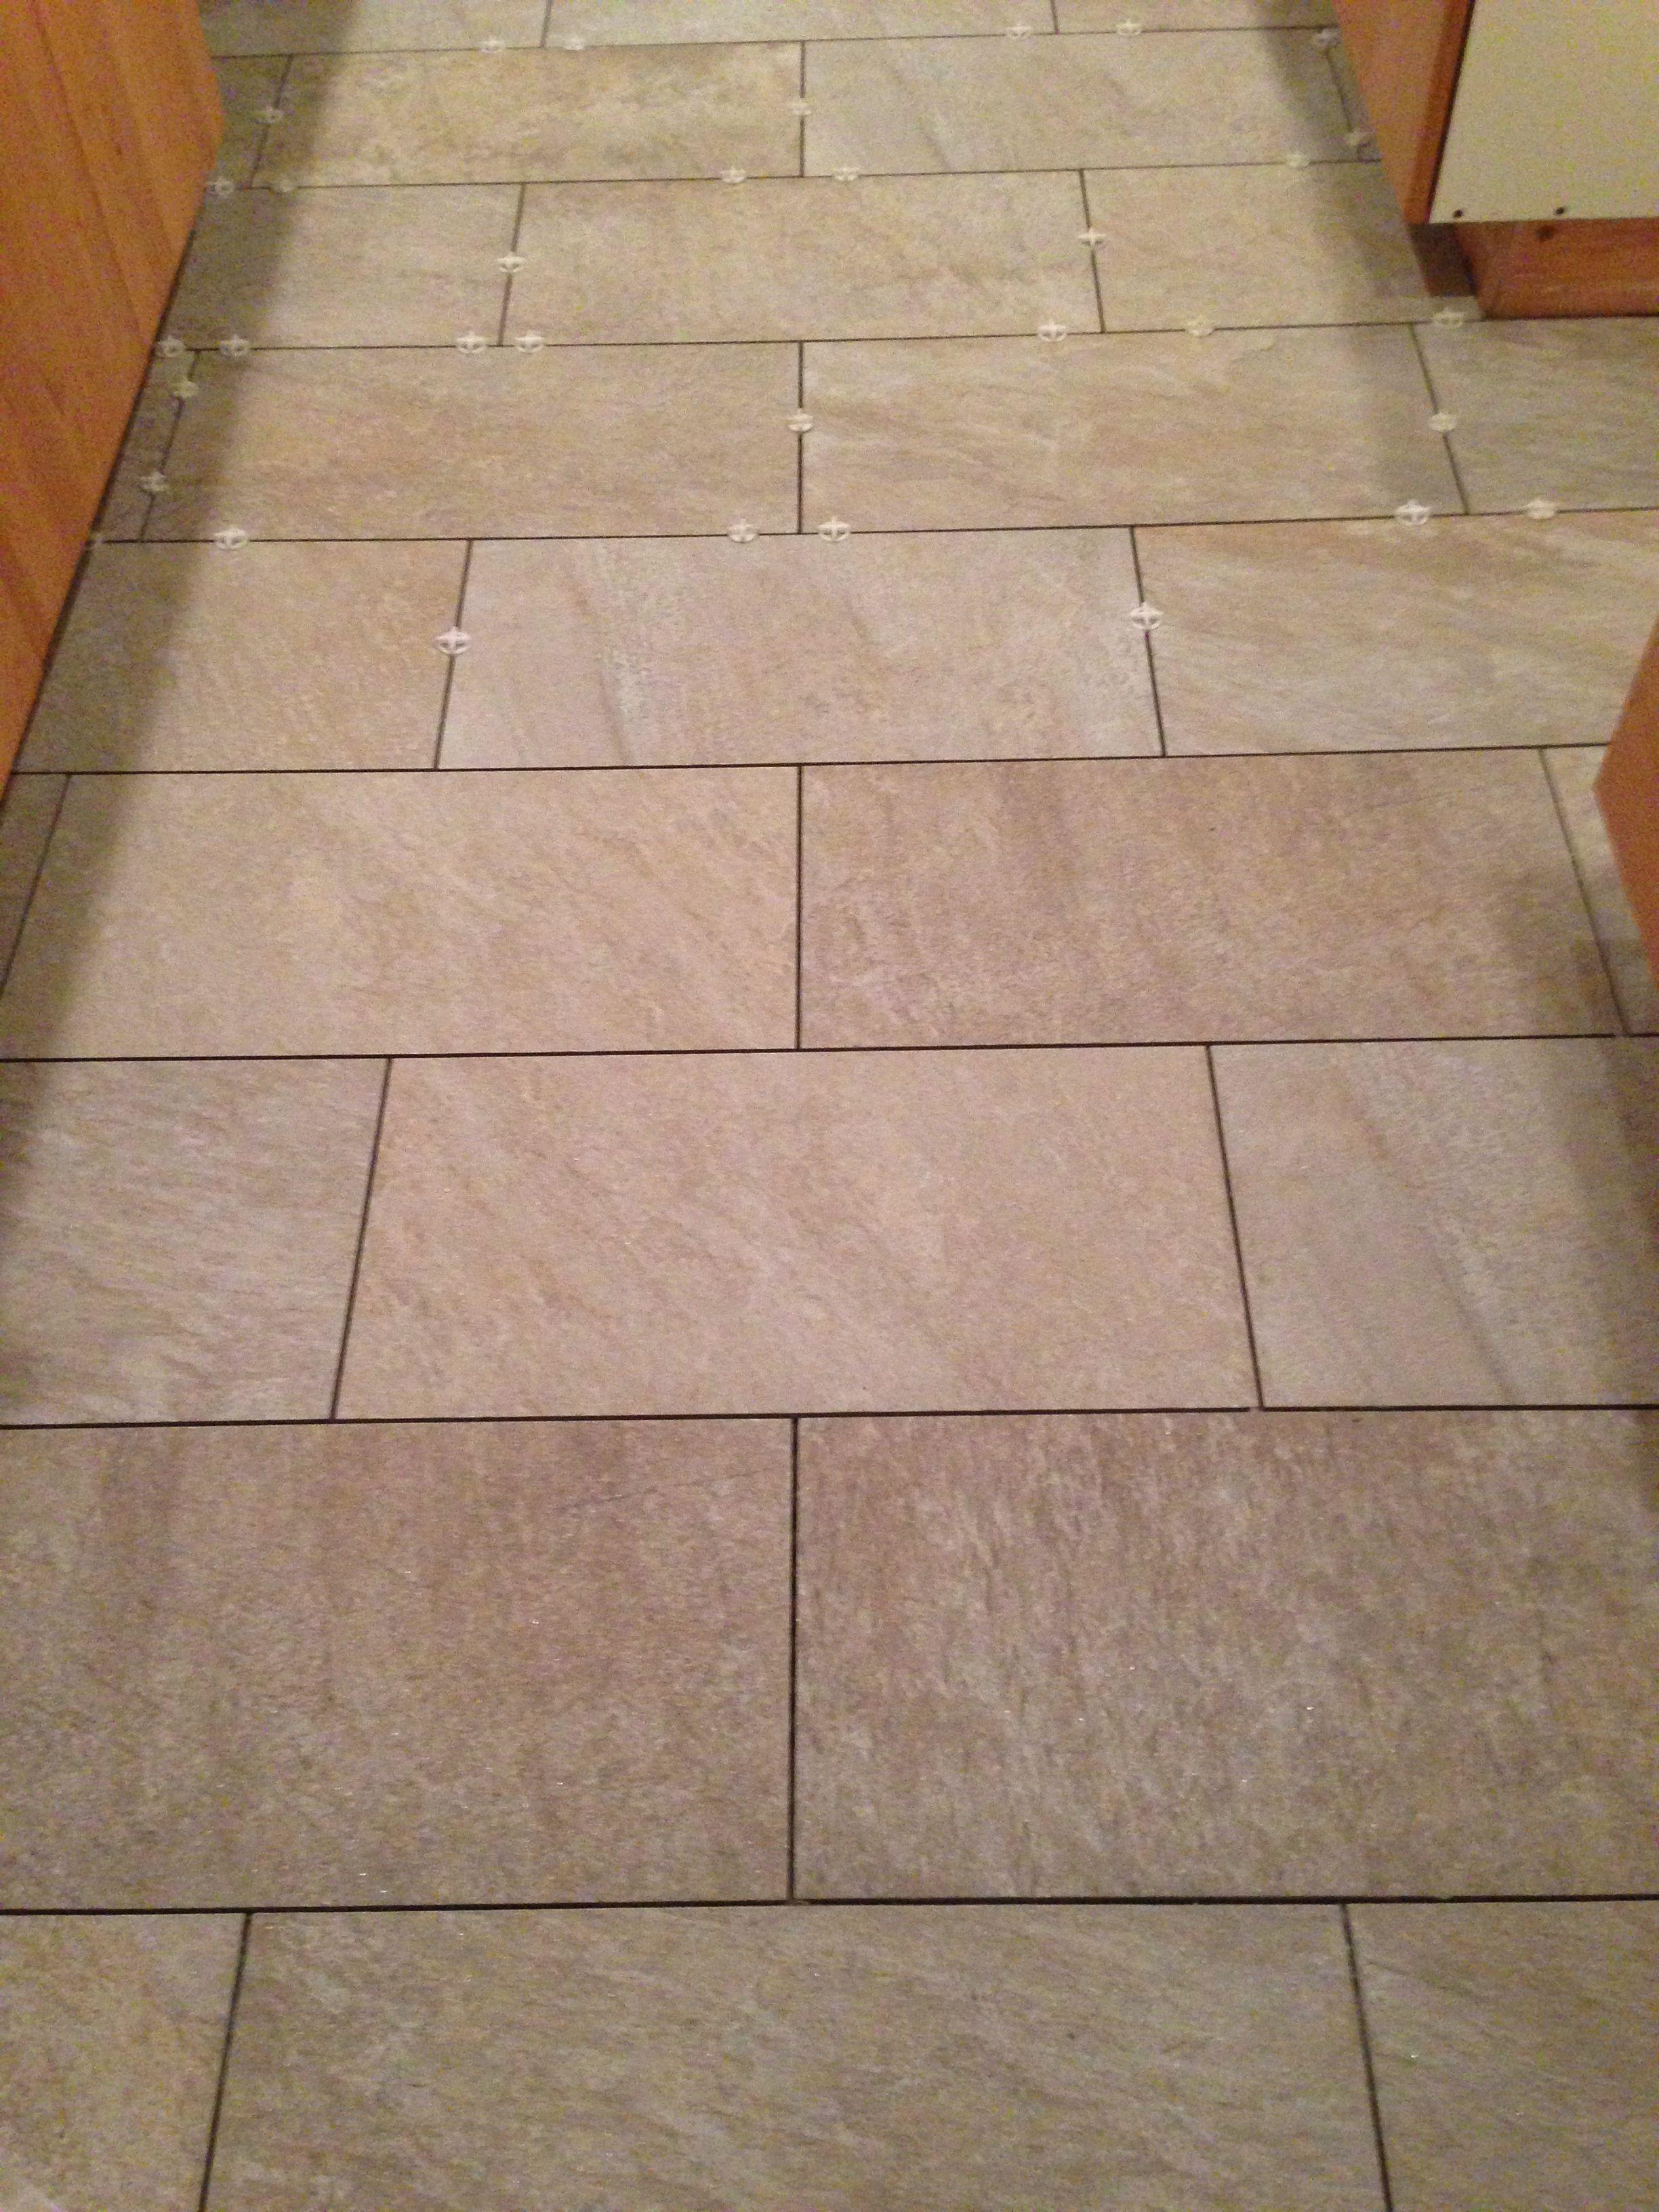 pental anthology grey indoor 12x24 tile kitchen floor mix of grey